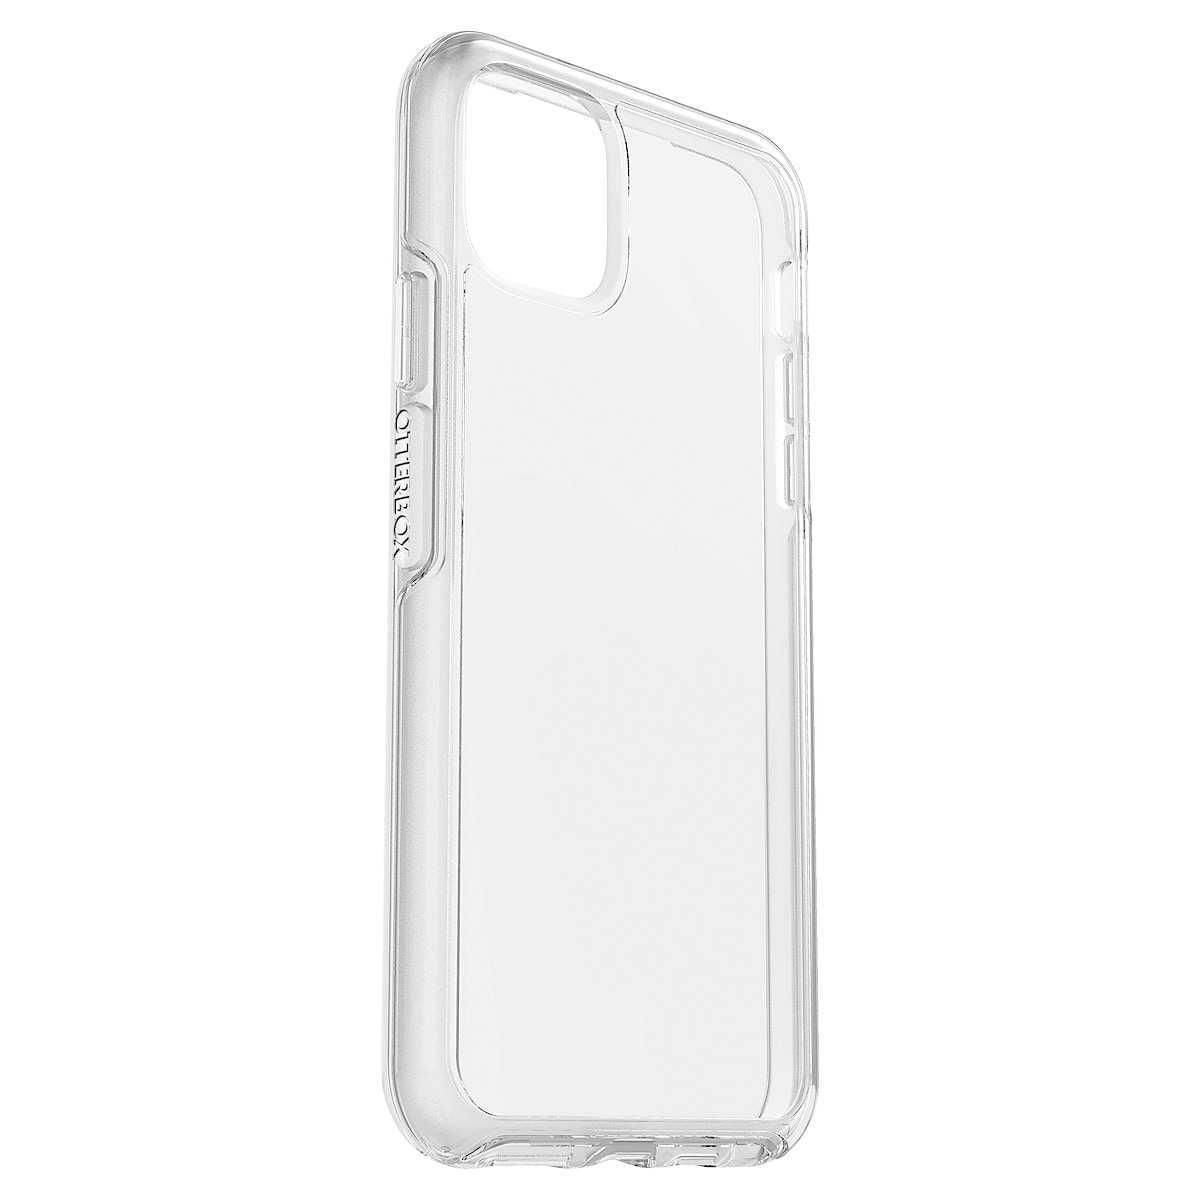 Otterbox Symmetry Clear för iPhone 11 Pro Max Mobilskal